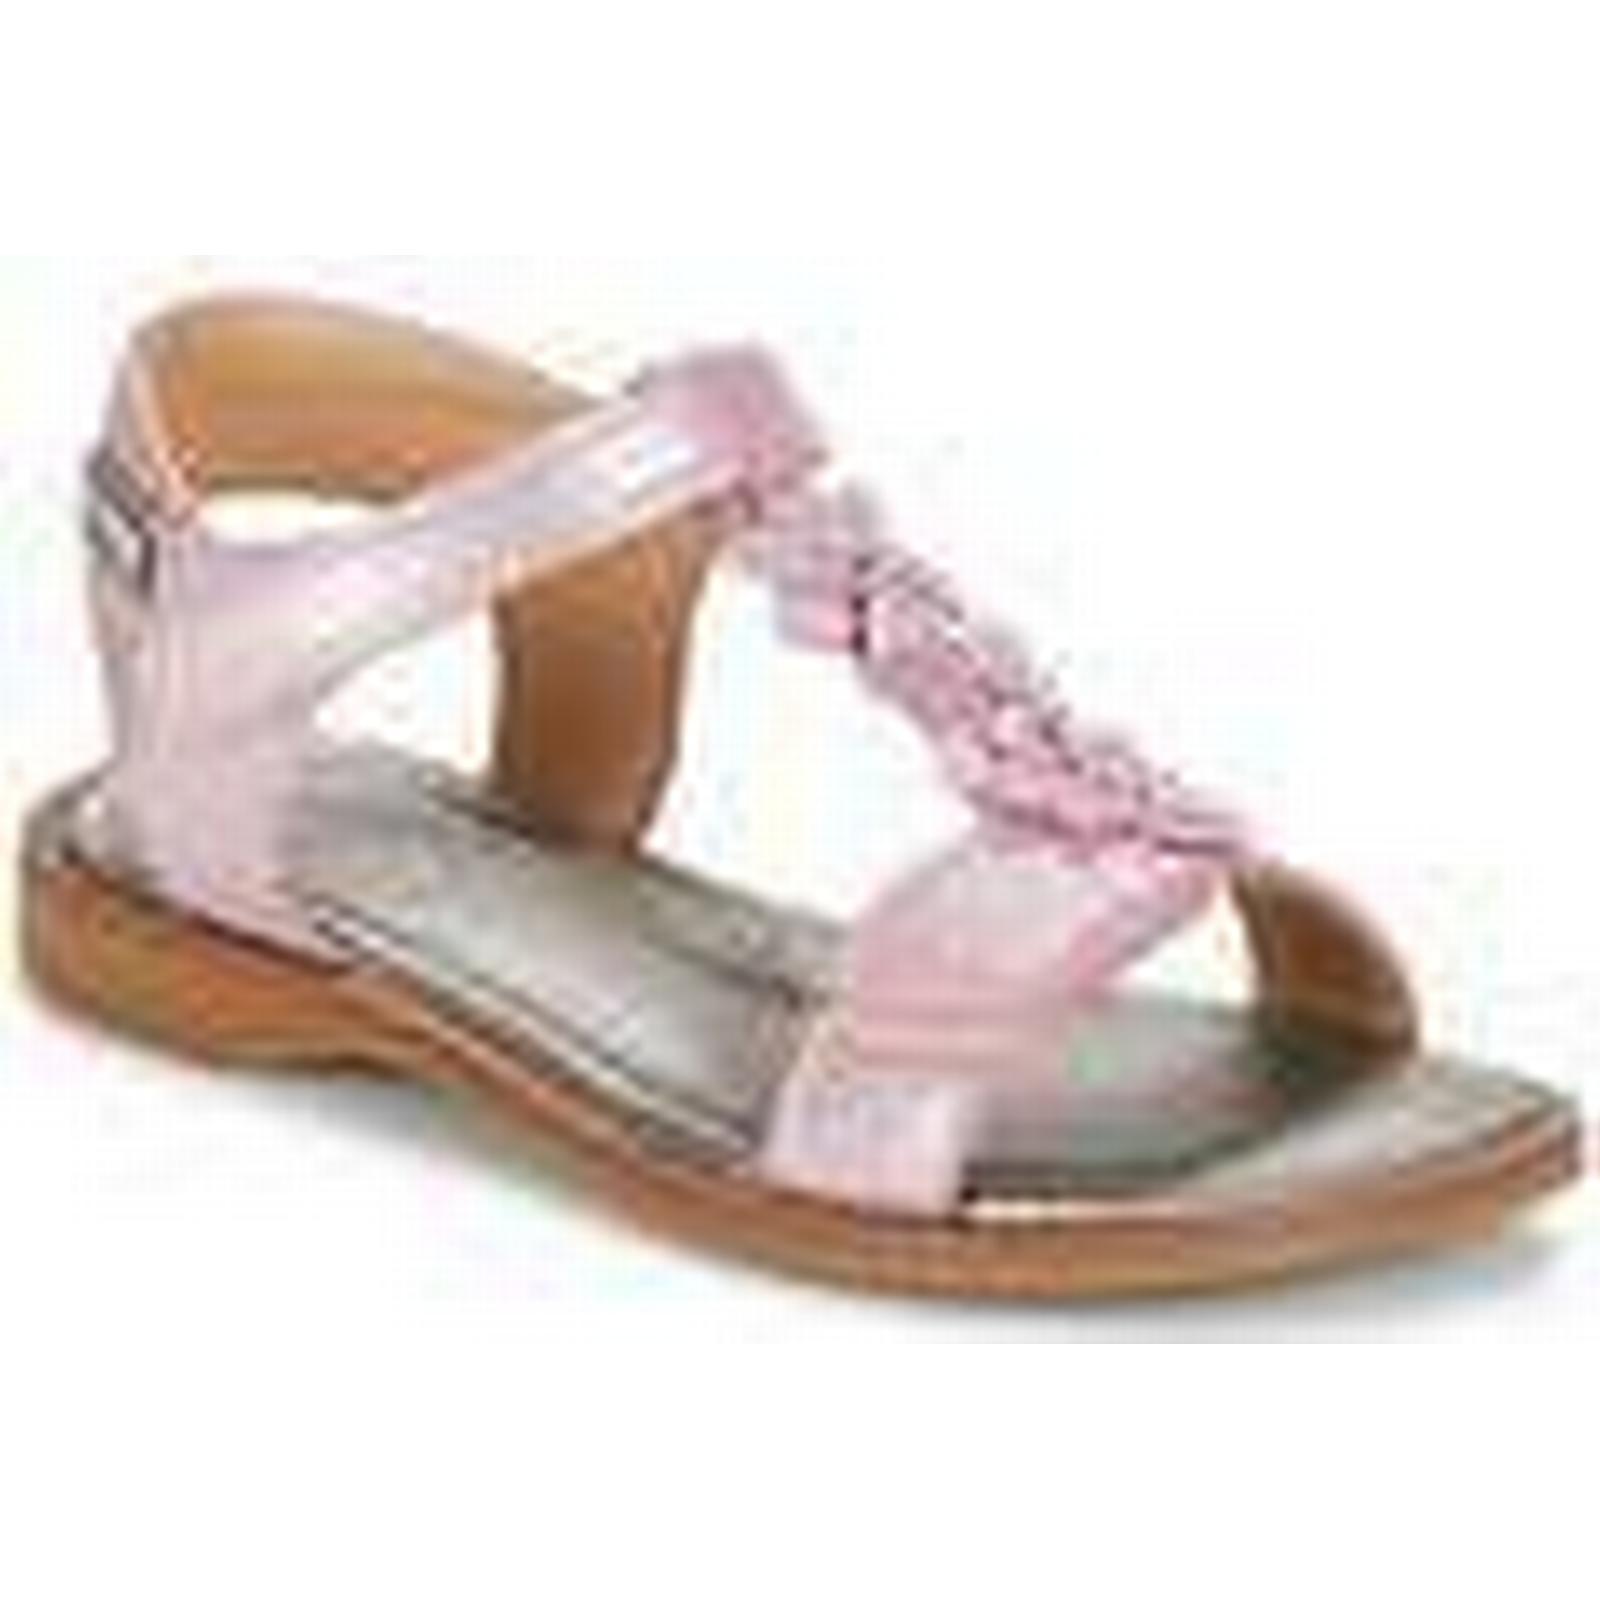 PLDM by Palladium  SALUTE  girls's Sandals in Pink Pink in 4c73d2